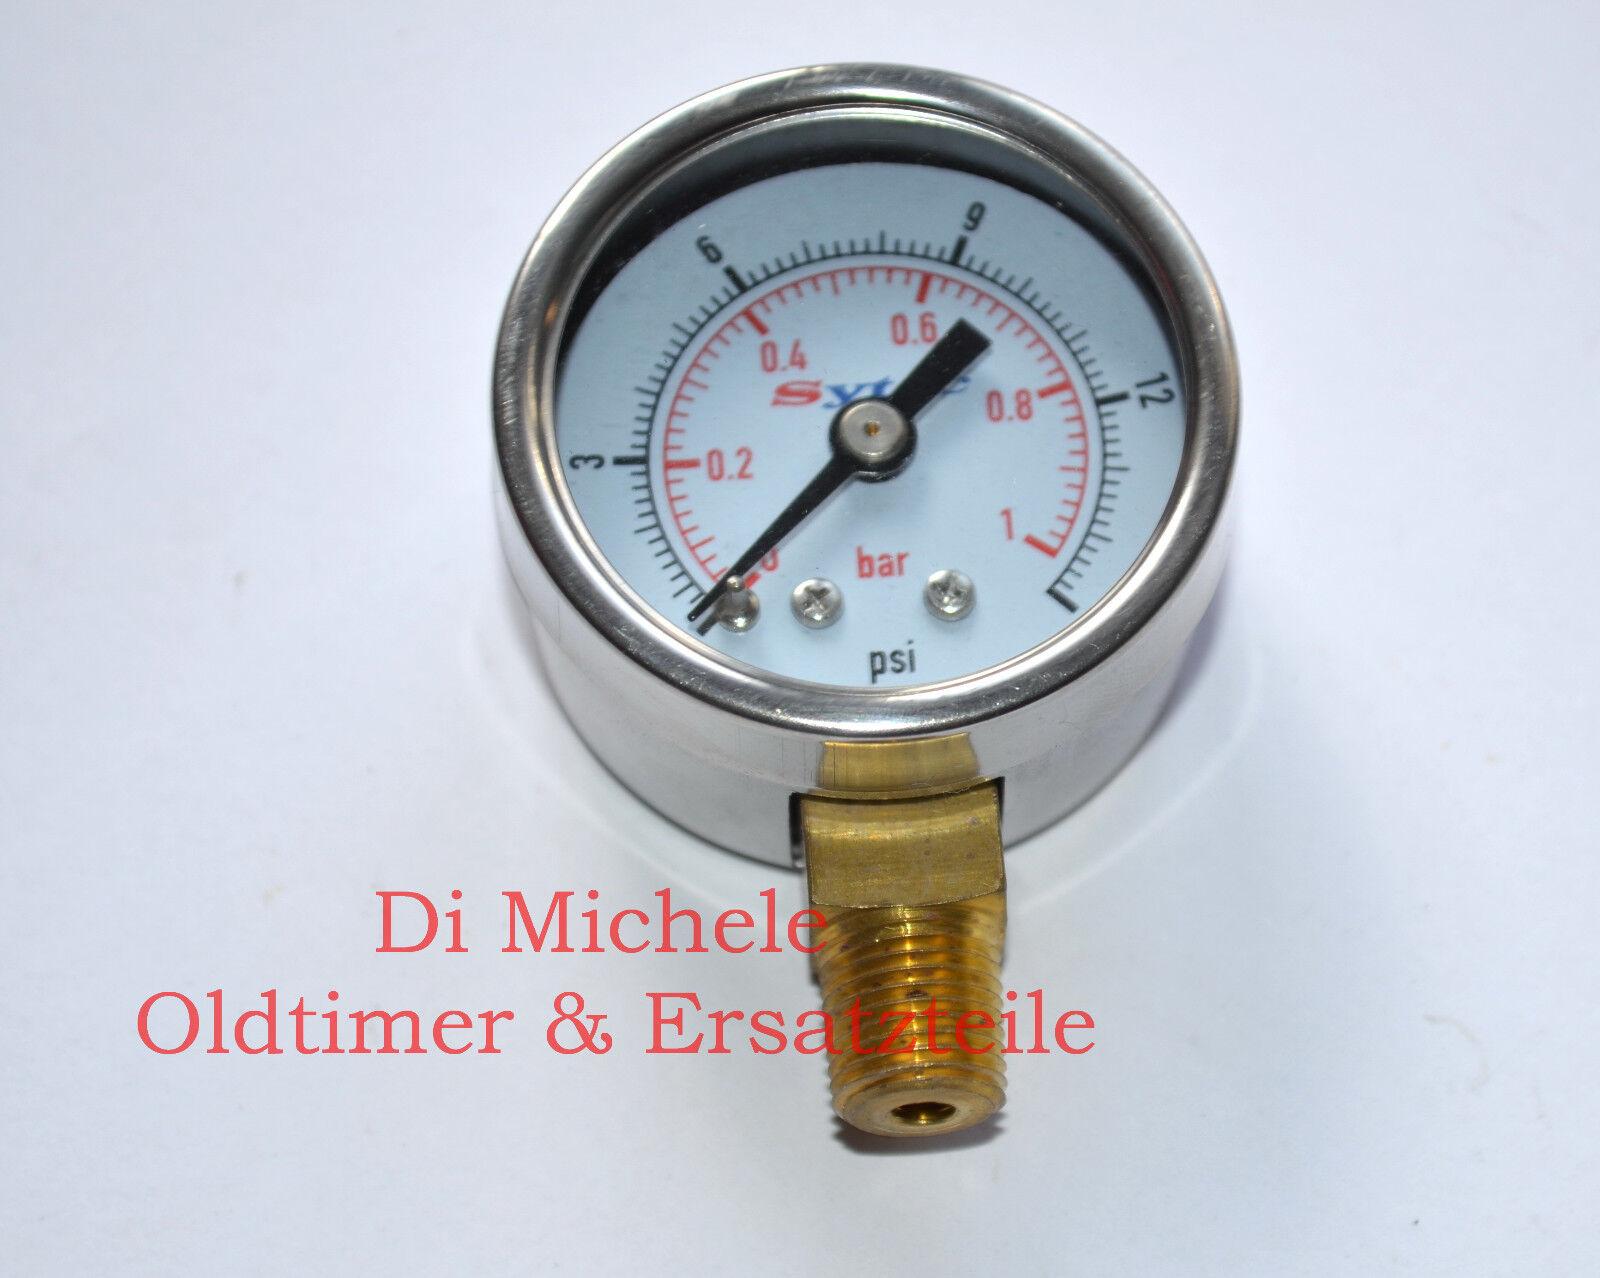 Carburettor Fuel Pressure Gauge Gauge, bar   Psi, Gasoline Display